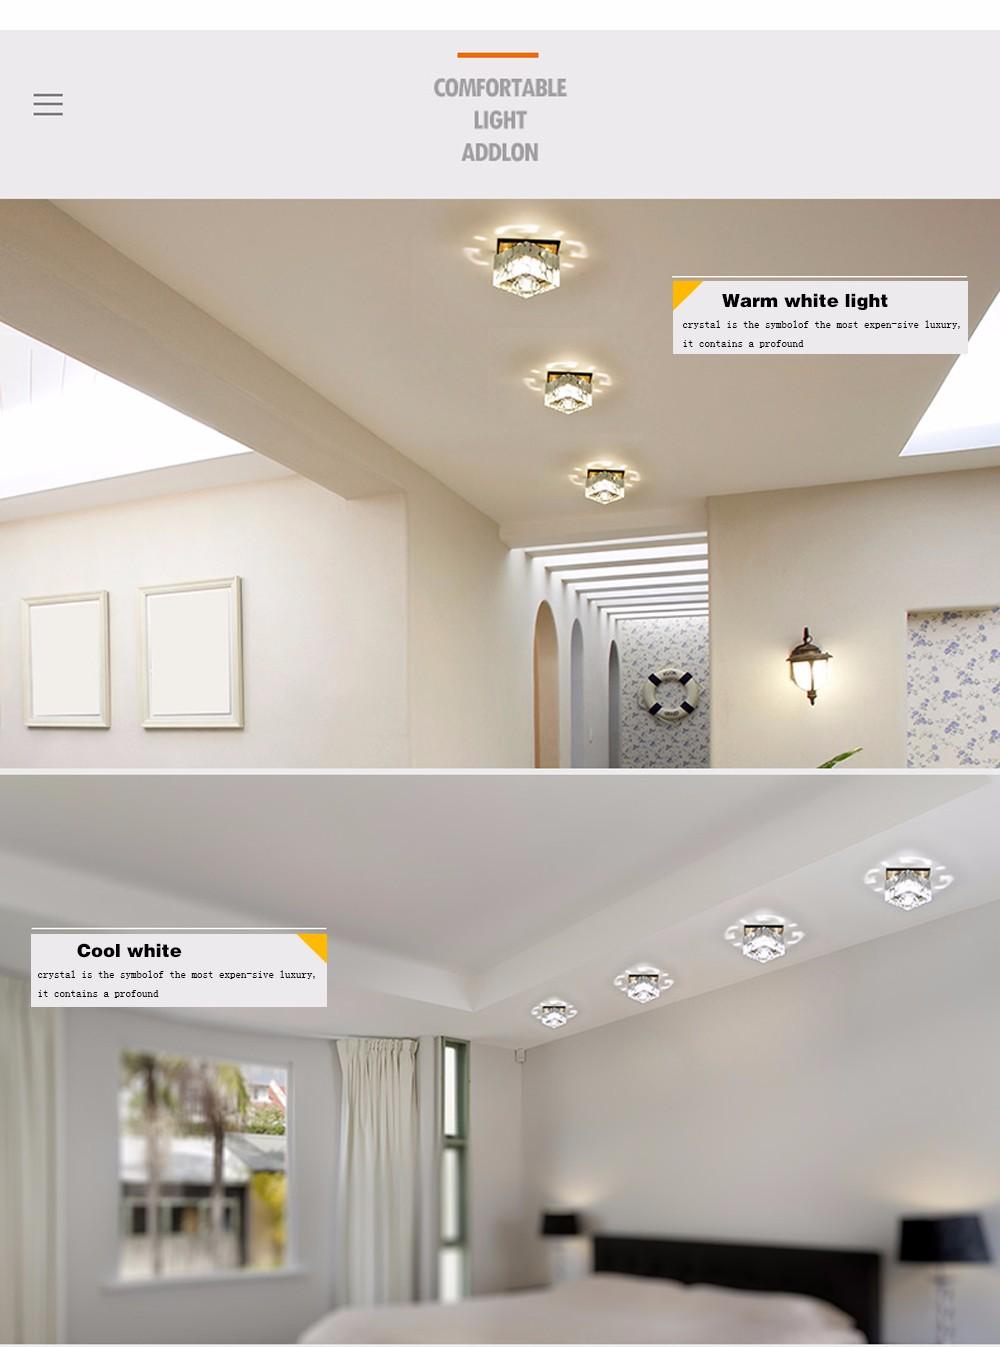 Fumat Modern Ceiling Light K9 Crystal Ball Lustre Mount Hallway Lighting Fixture Led Plafondlamp Luminaria Pendant Ceiling Lamp Comfortable And Easy To Wear Lights & Lighting Ceiling Lights & Fans